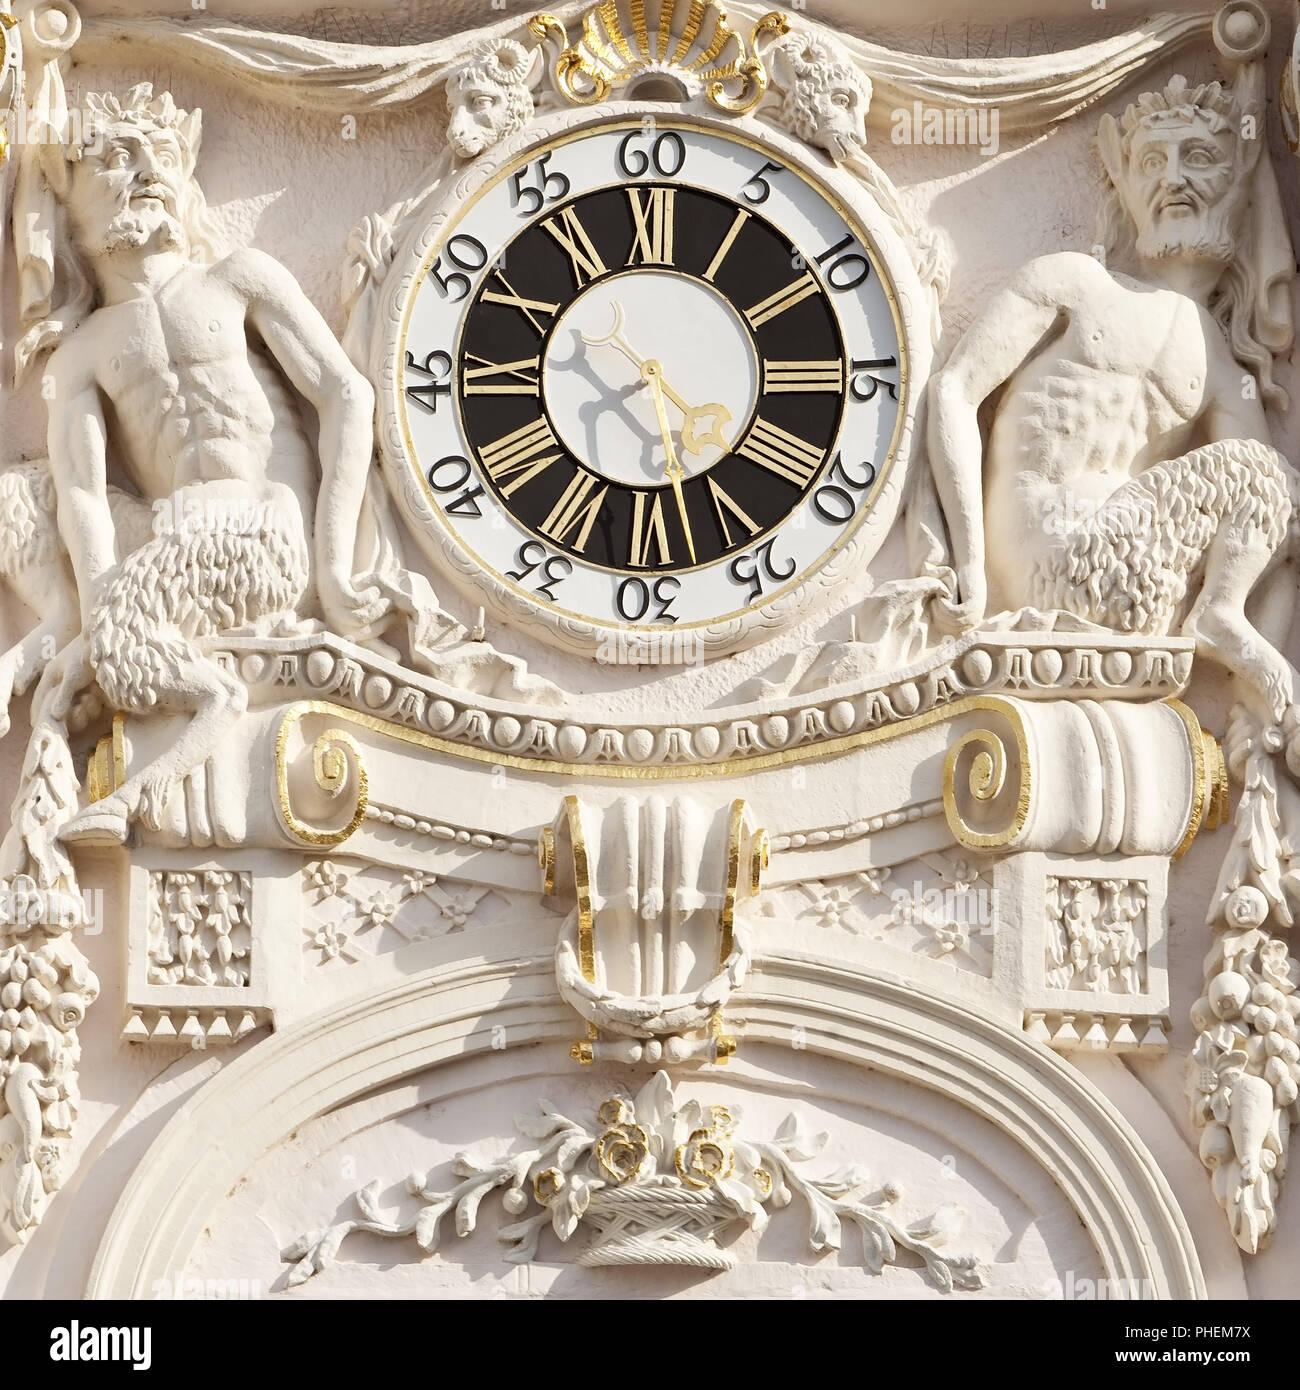 restored historic townhall clock, Bonn, North Rhine-Westphalia, Germany, Europe - Stock Image